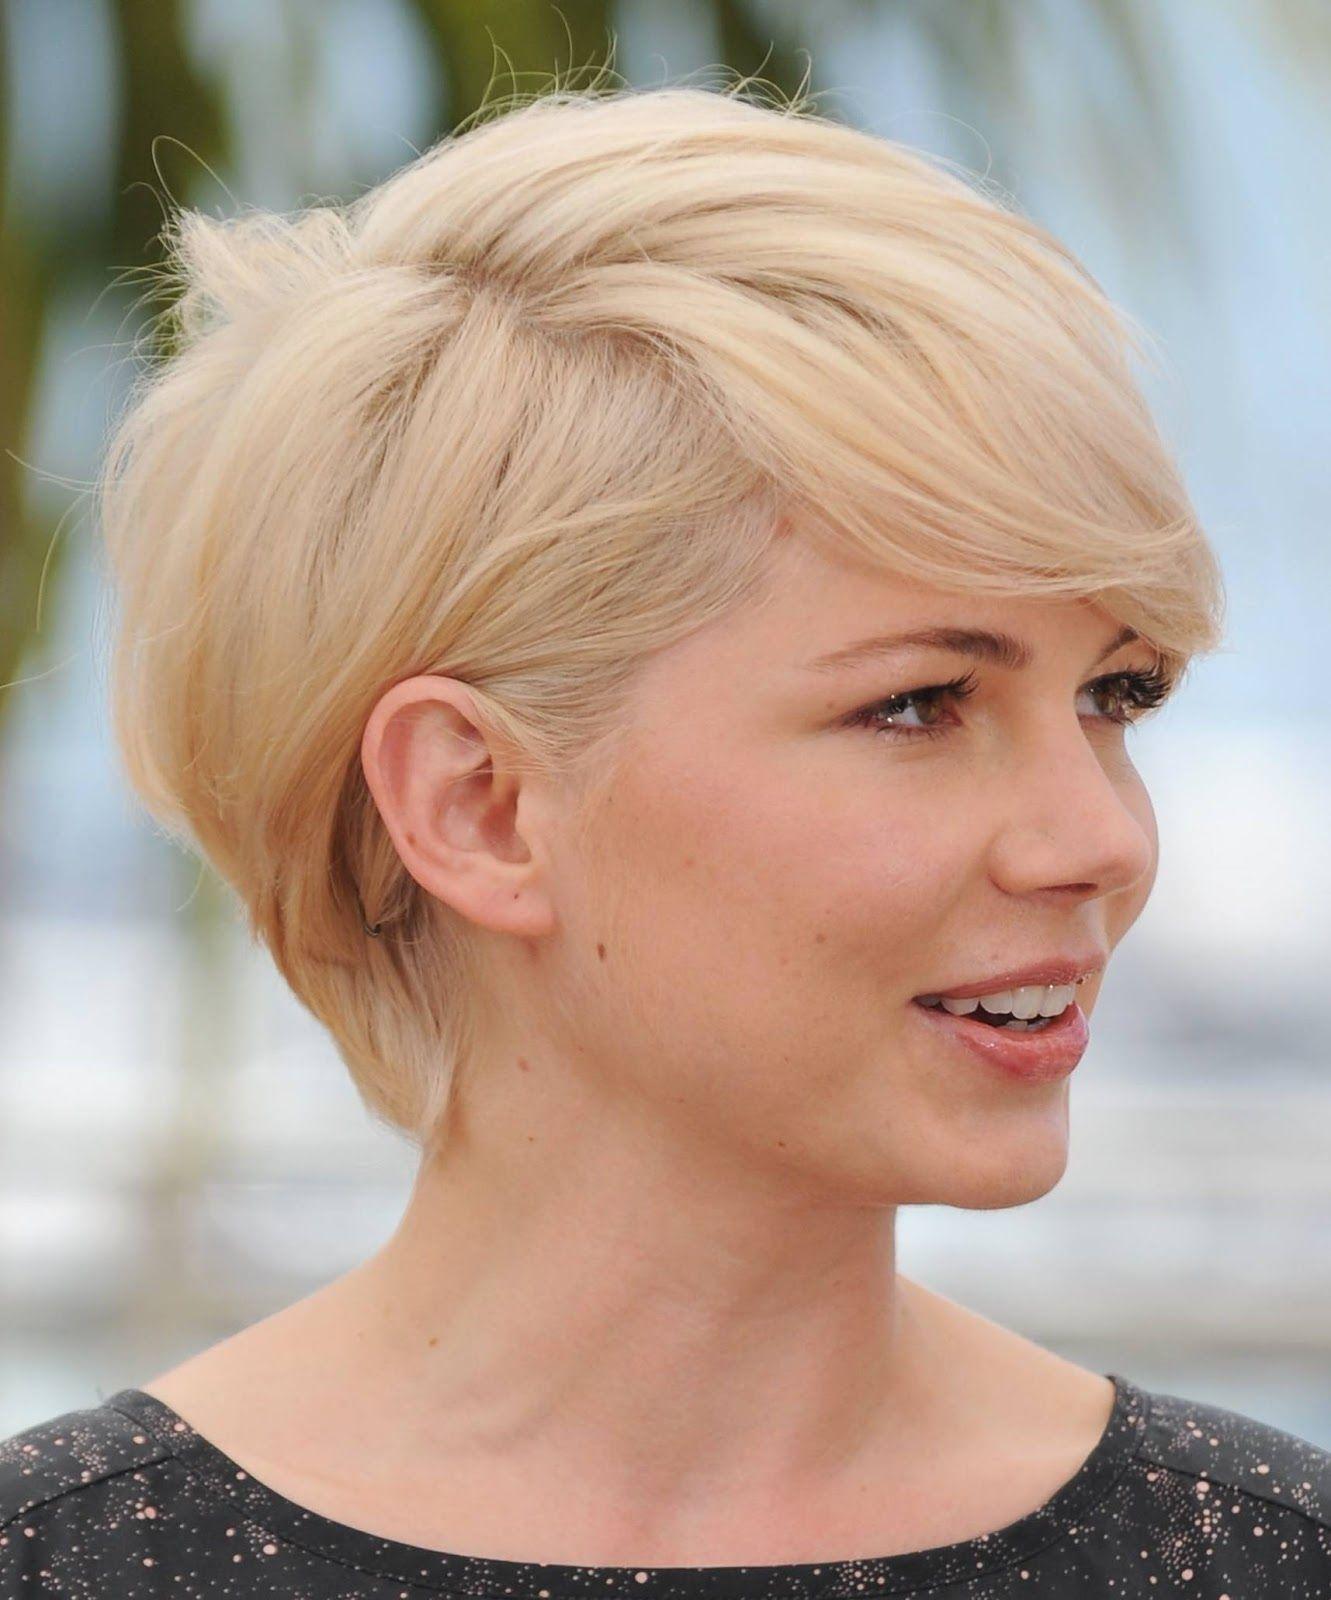 Admirable 1000 Images About Short Blonde Hair On Pinterest Super Short Short Hairstyles For Black Women Fulllsitofus